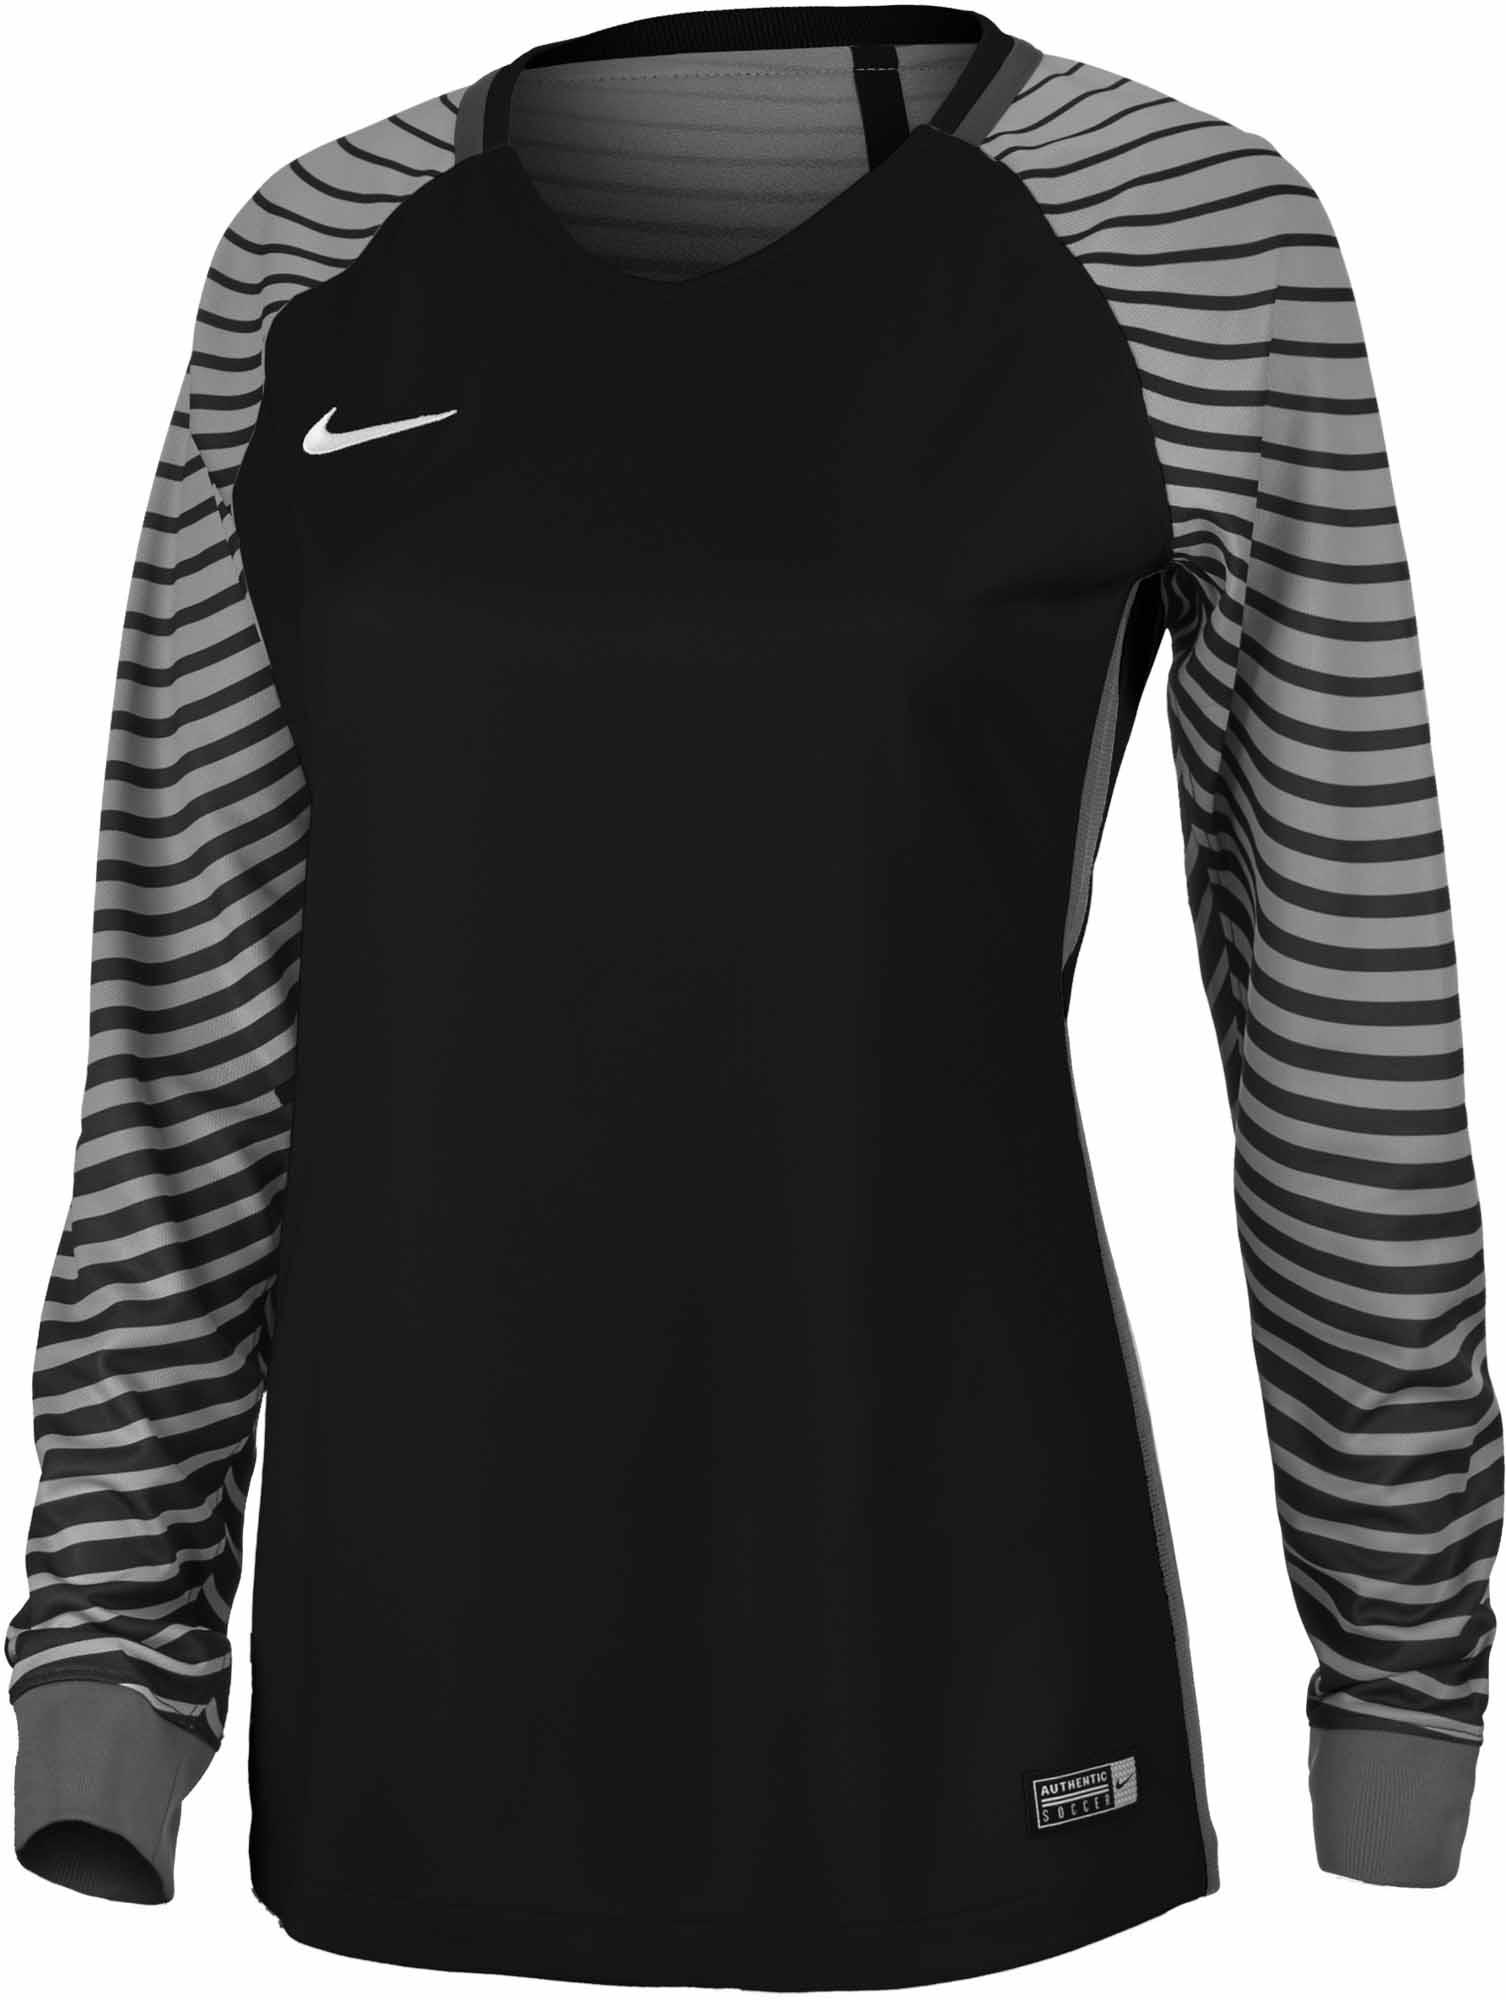 e2dc3aefa6f Nike Womens Gardien Goalkeeper Jersey - Black & Cool Grey